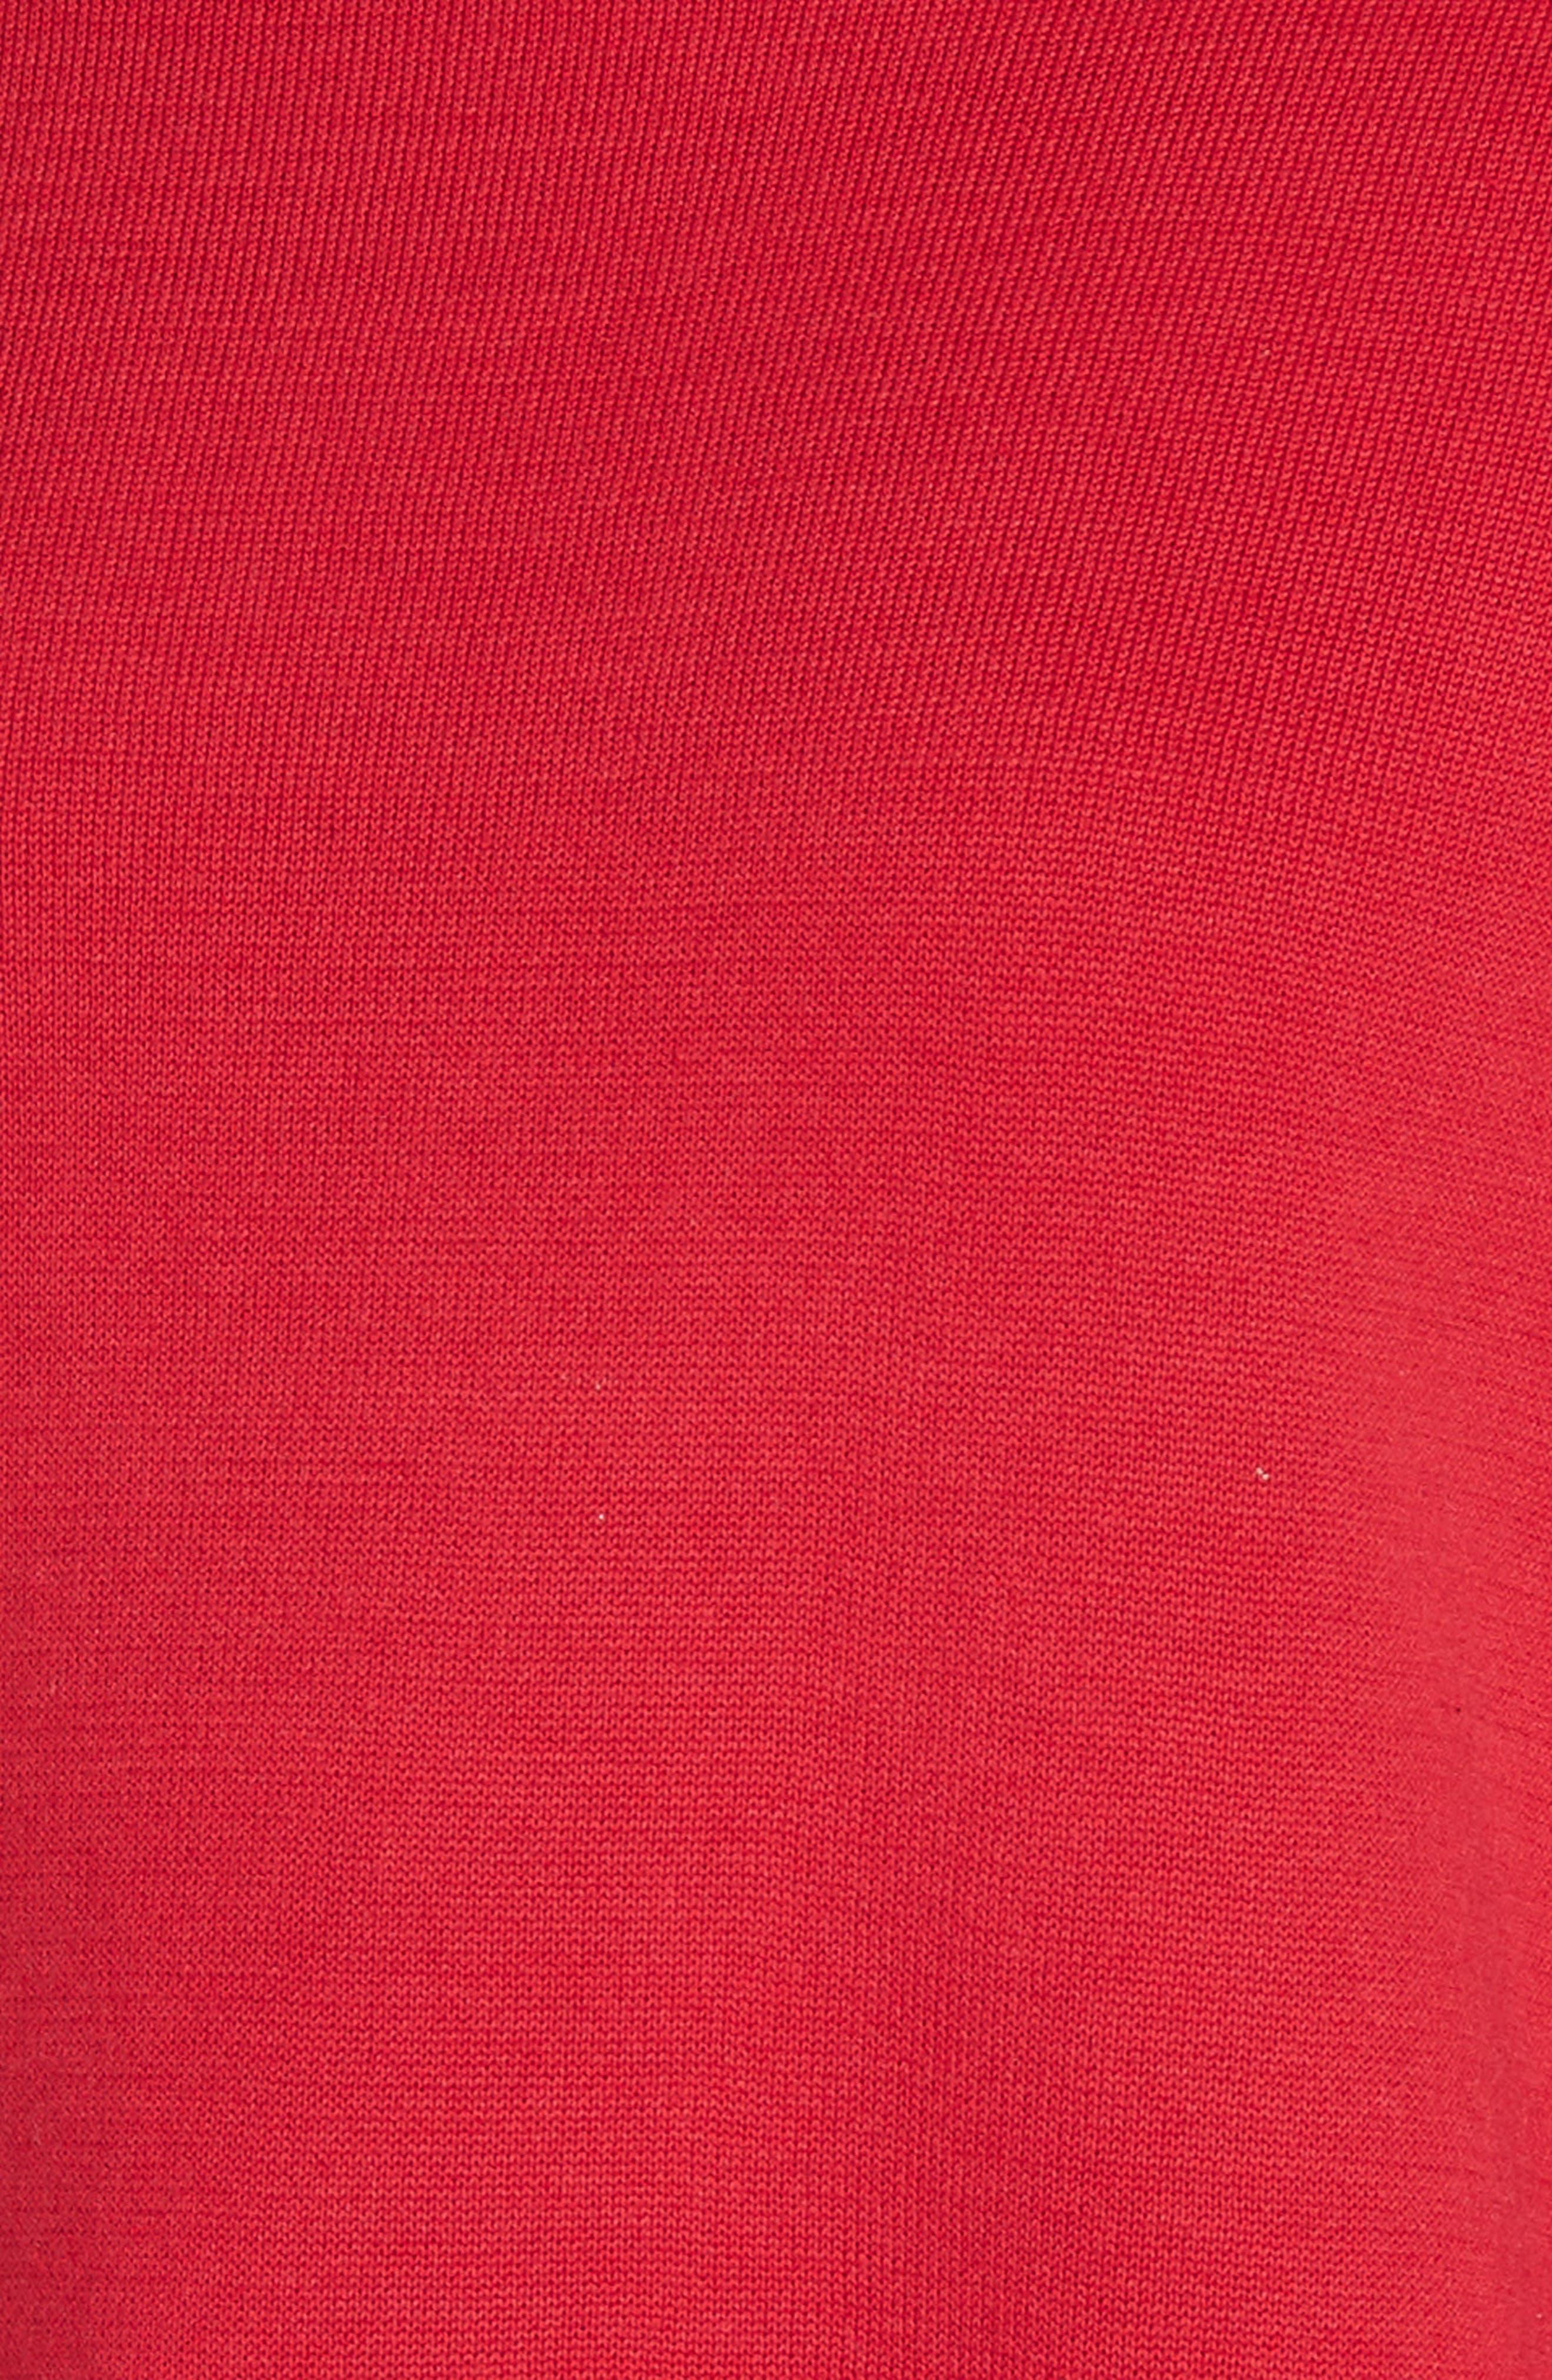 EILEEN FISHER, Reversilble Silk Blend Sweater, Alternate thumbnail 6, color, LACQUER